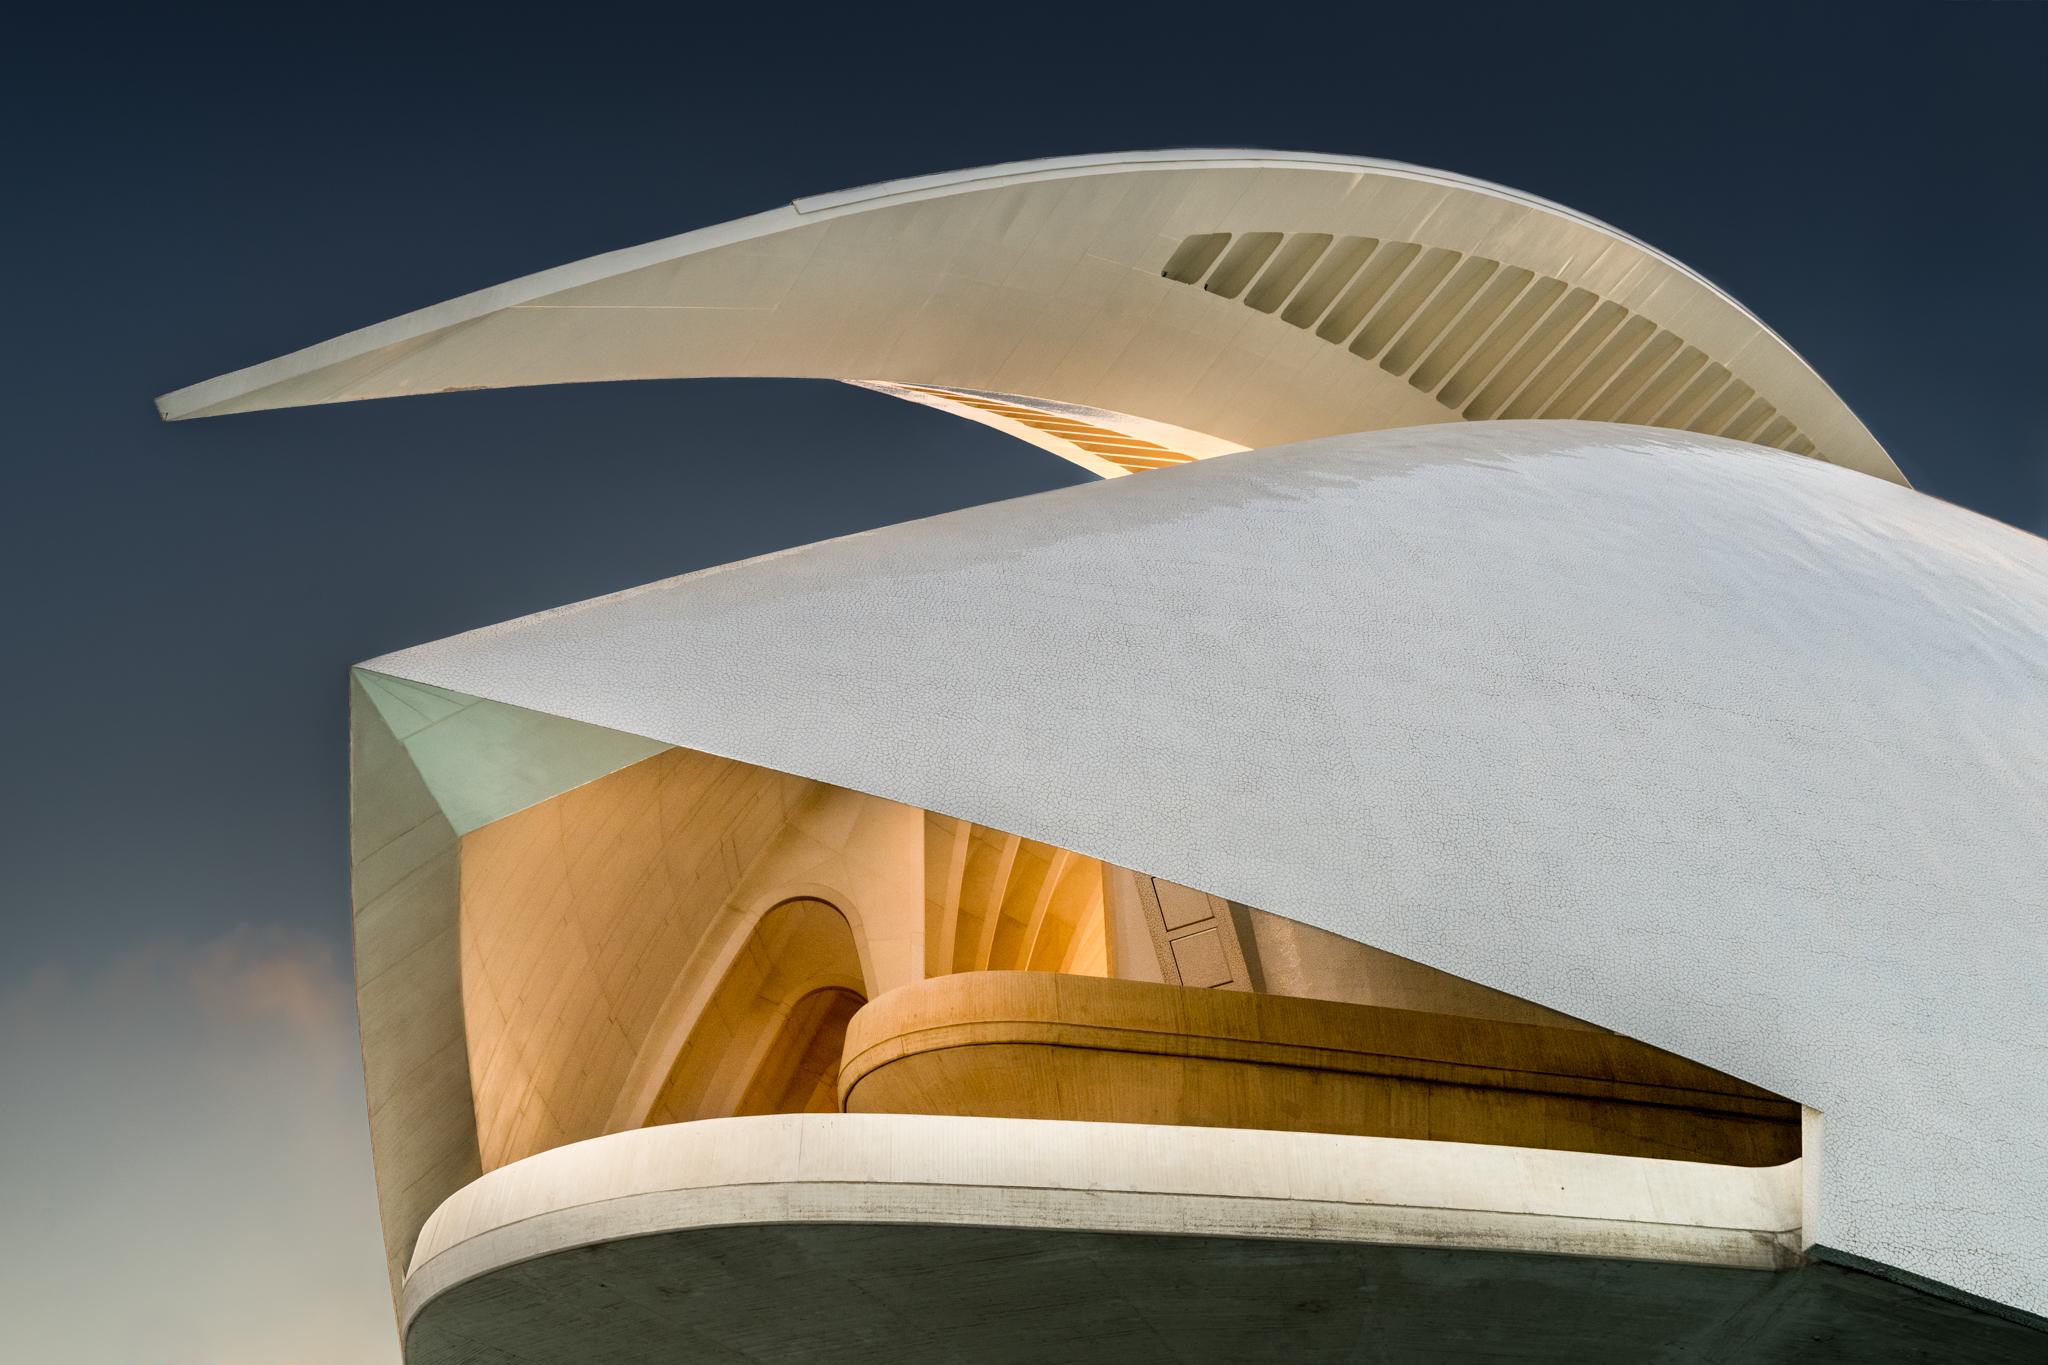 Palau de les Arts Reina Sofia, Spain